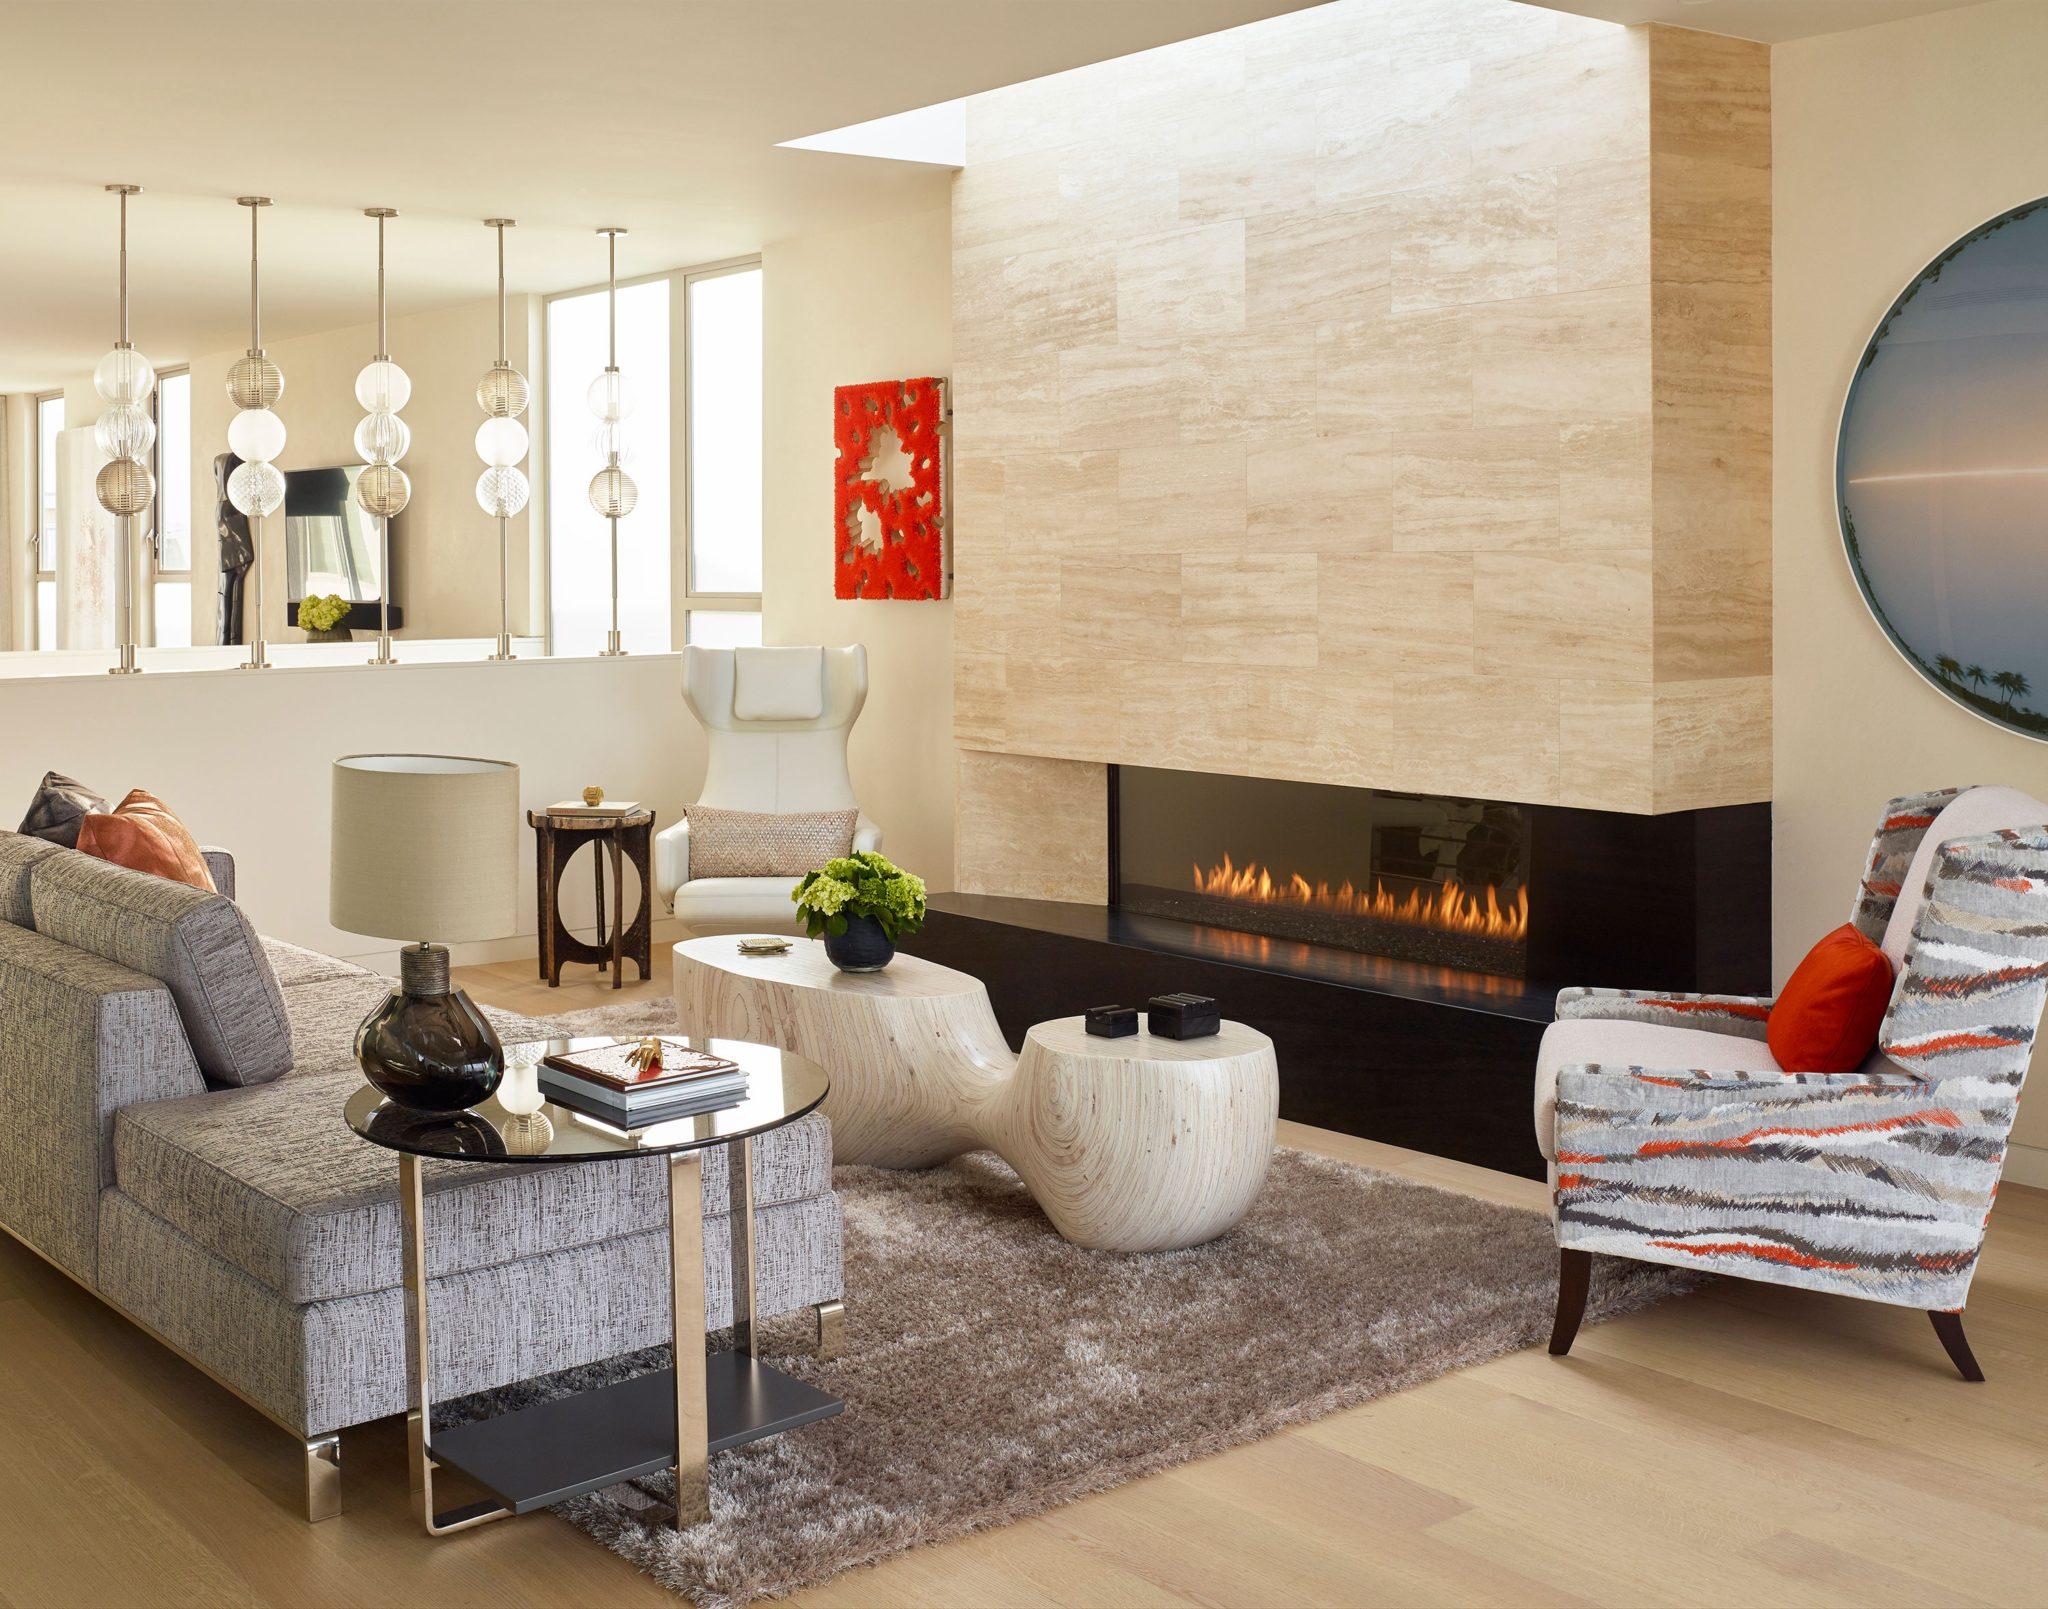 Interior design by Annette English & Associates